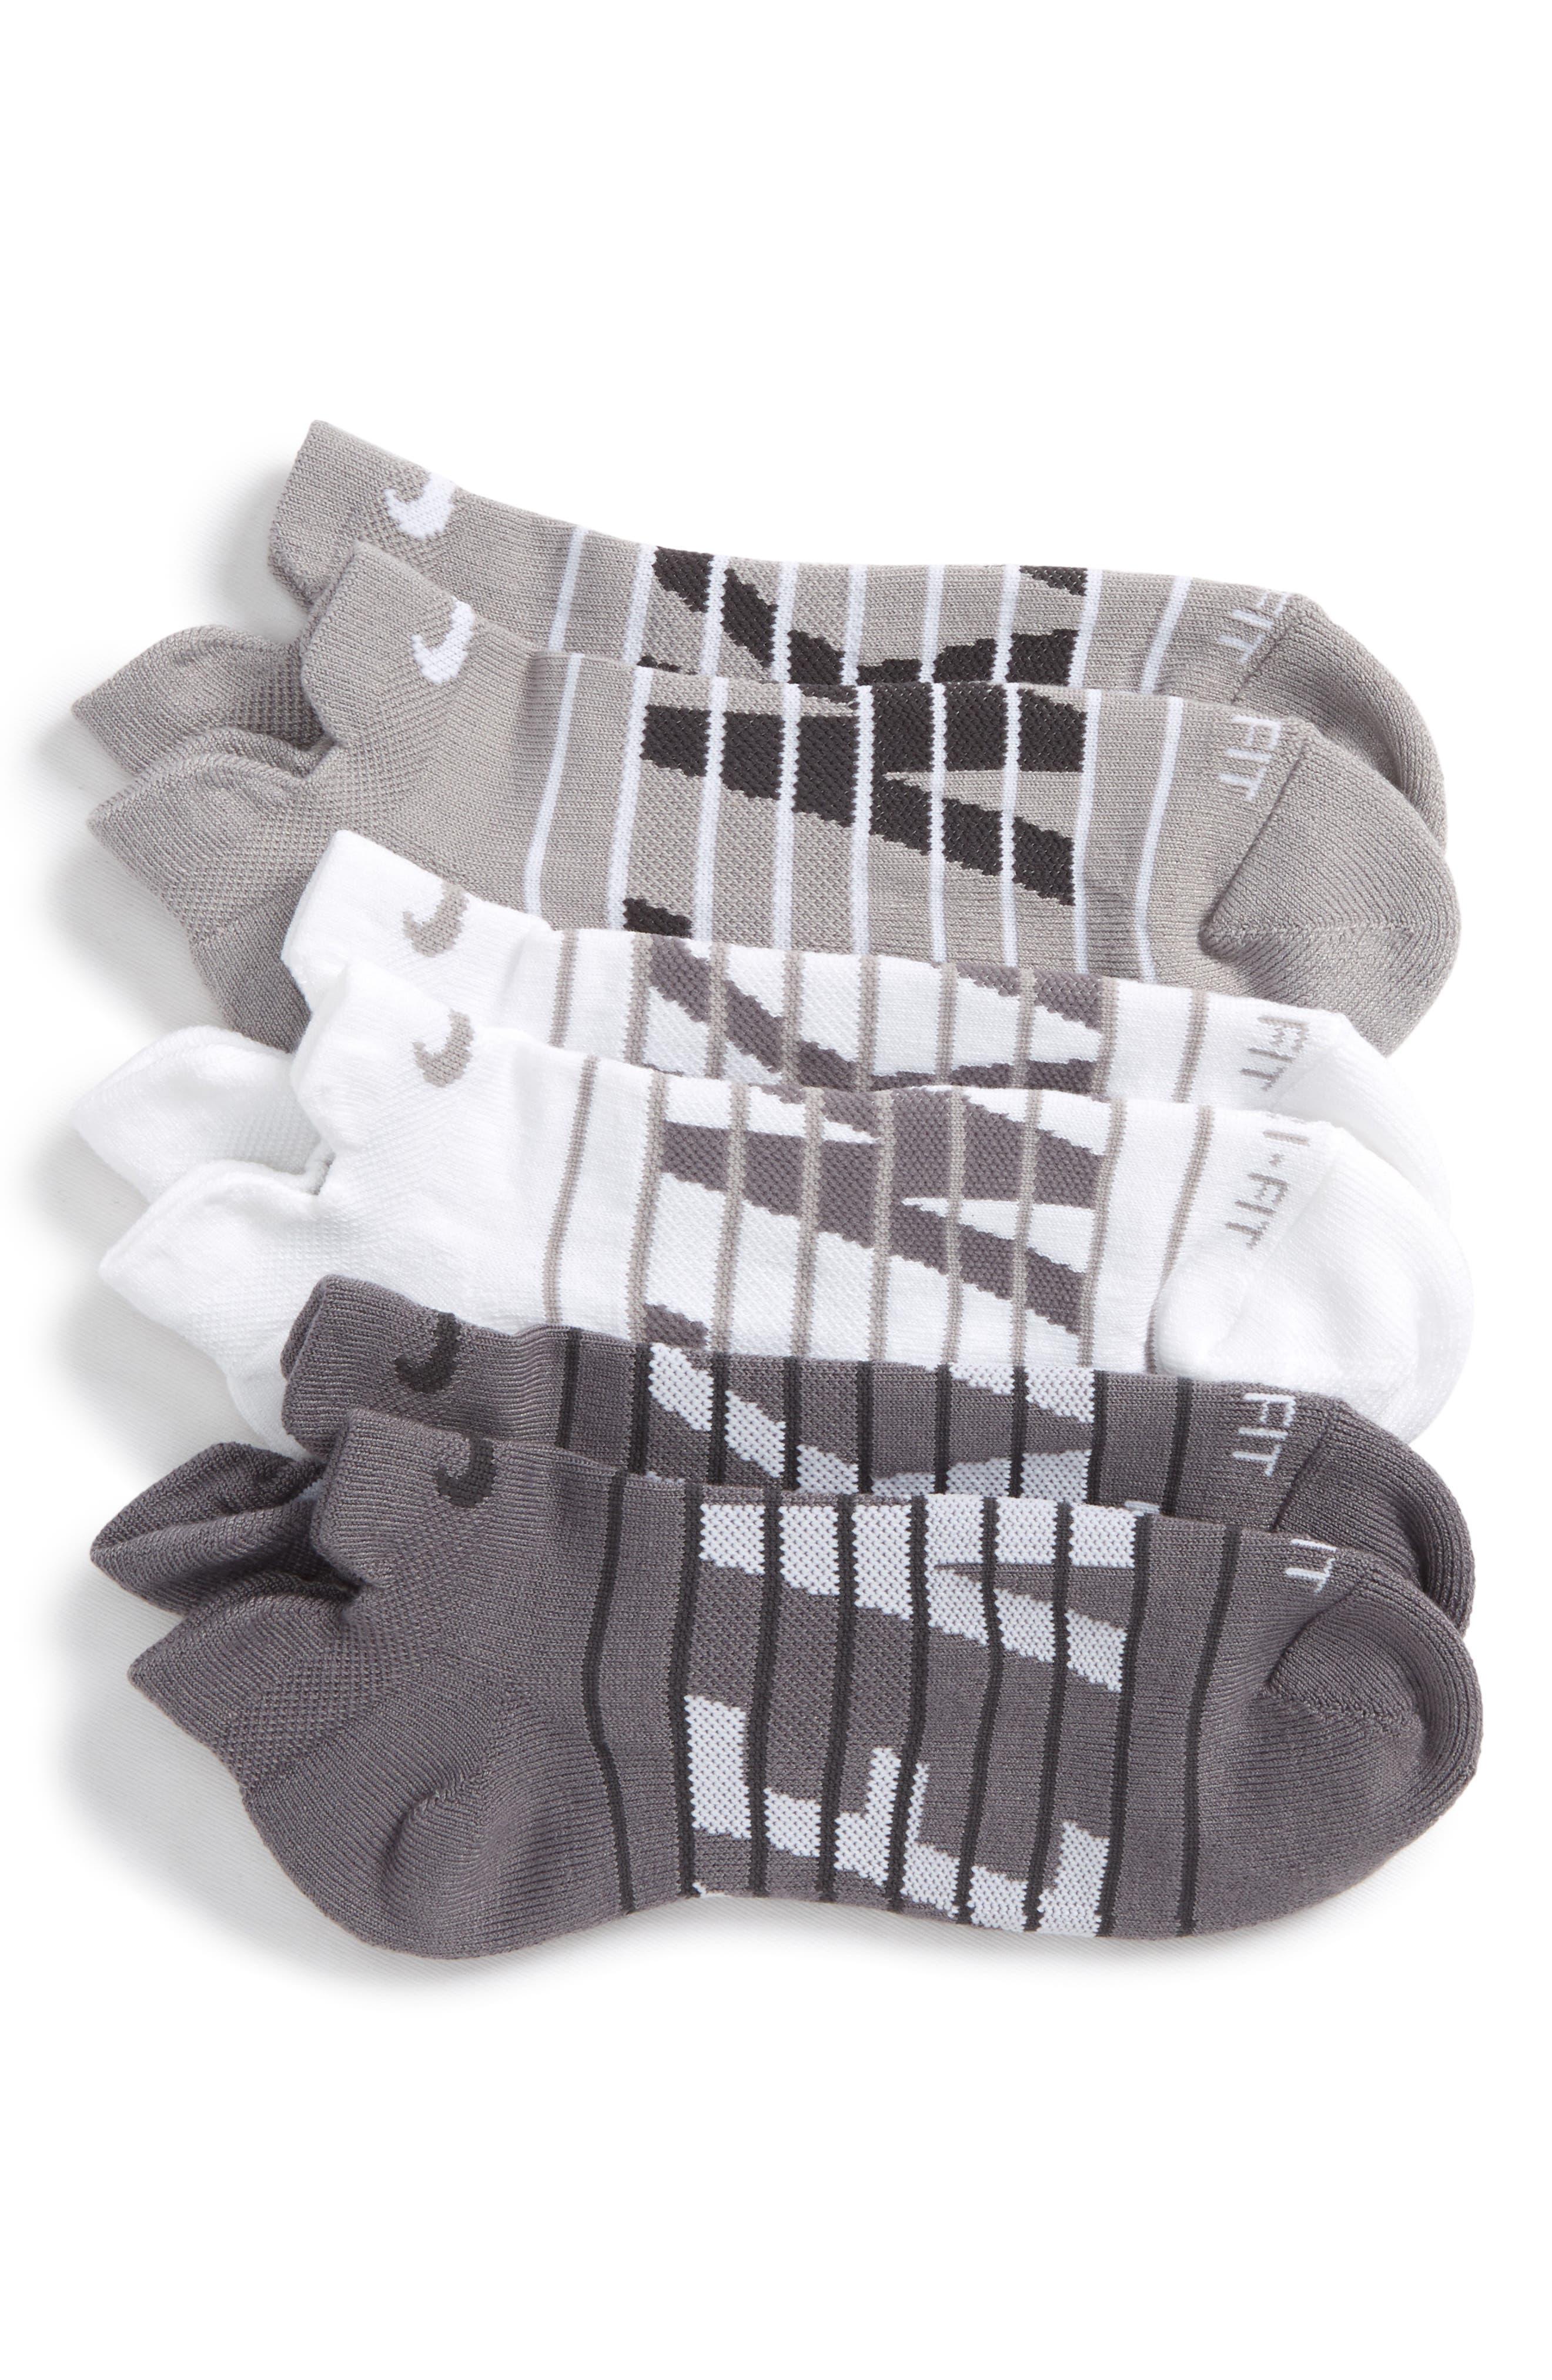 Dry Cushion 3-Pack Low-Cut Socks,                             Main thumbnail 1, color,                             020